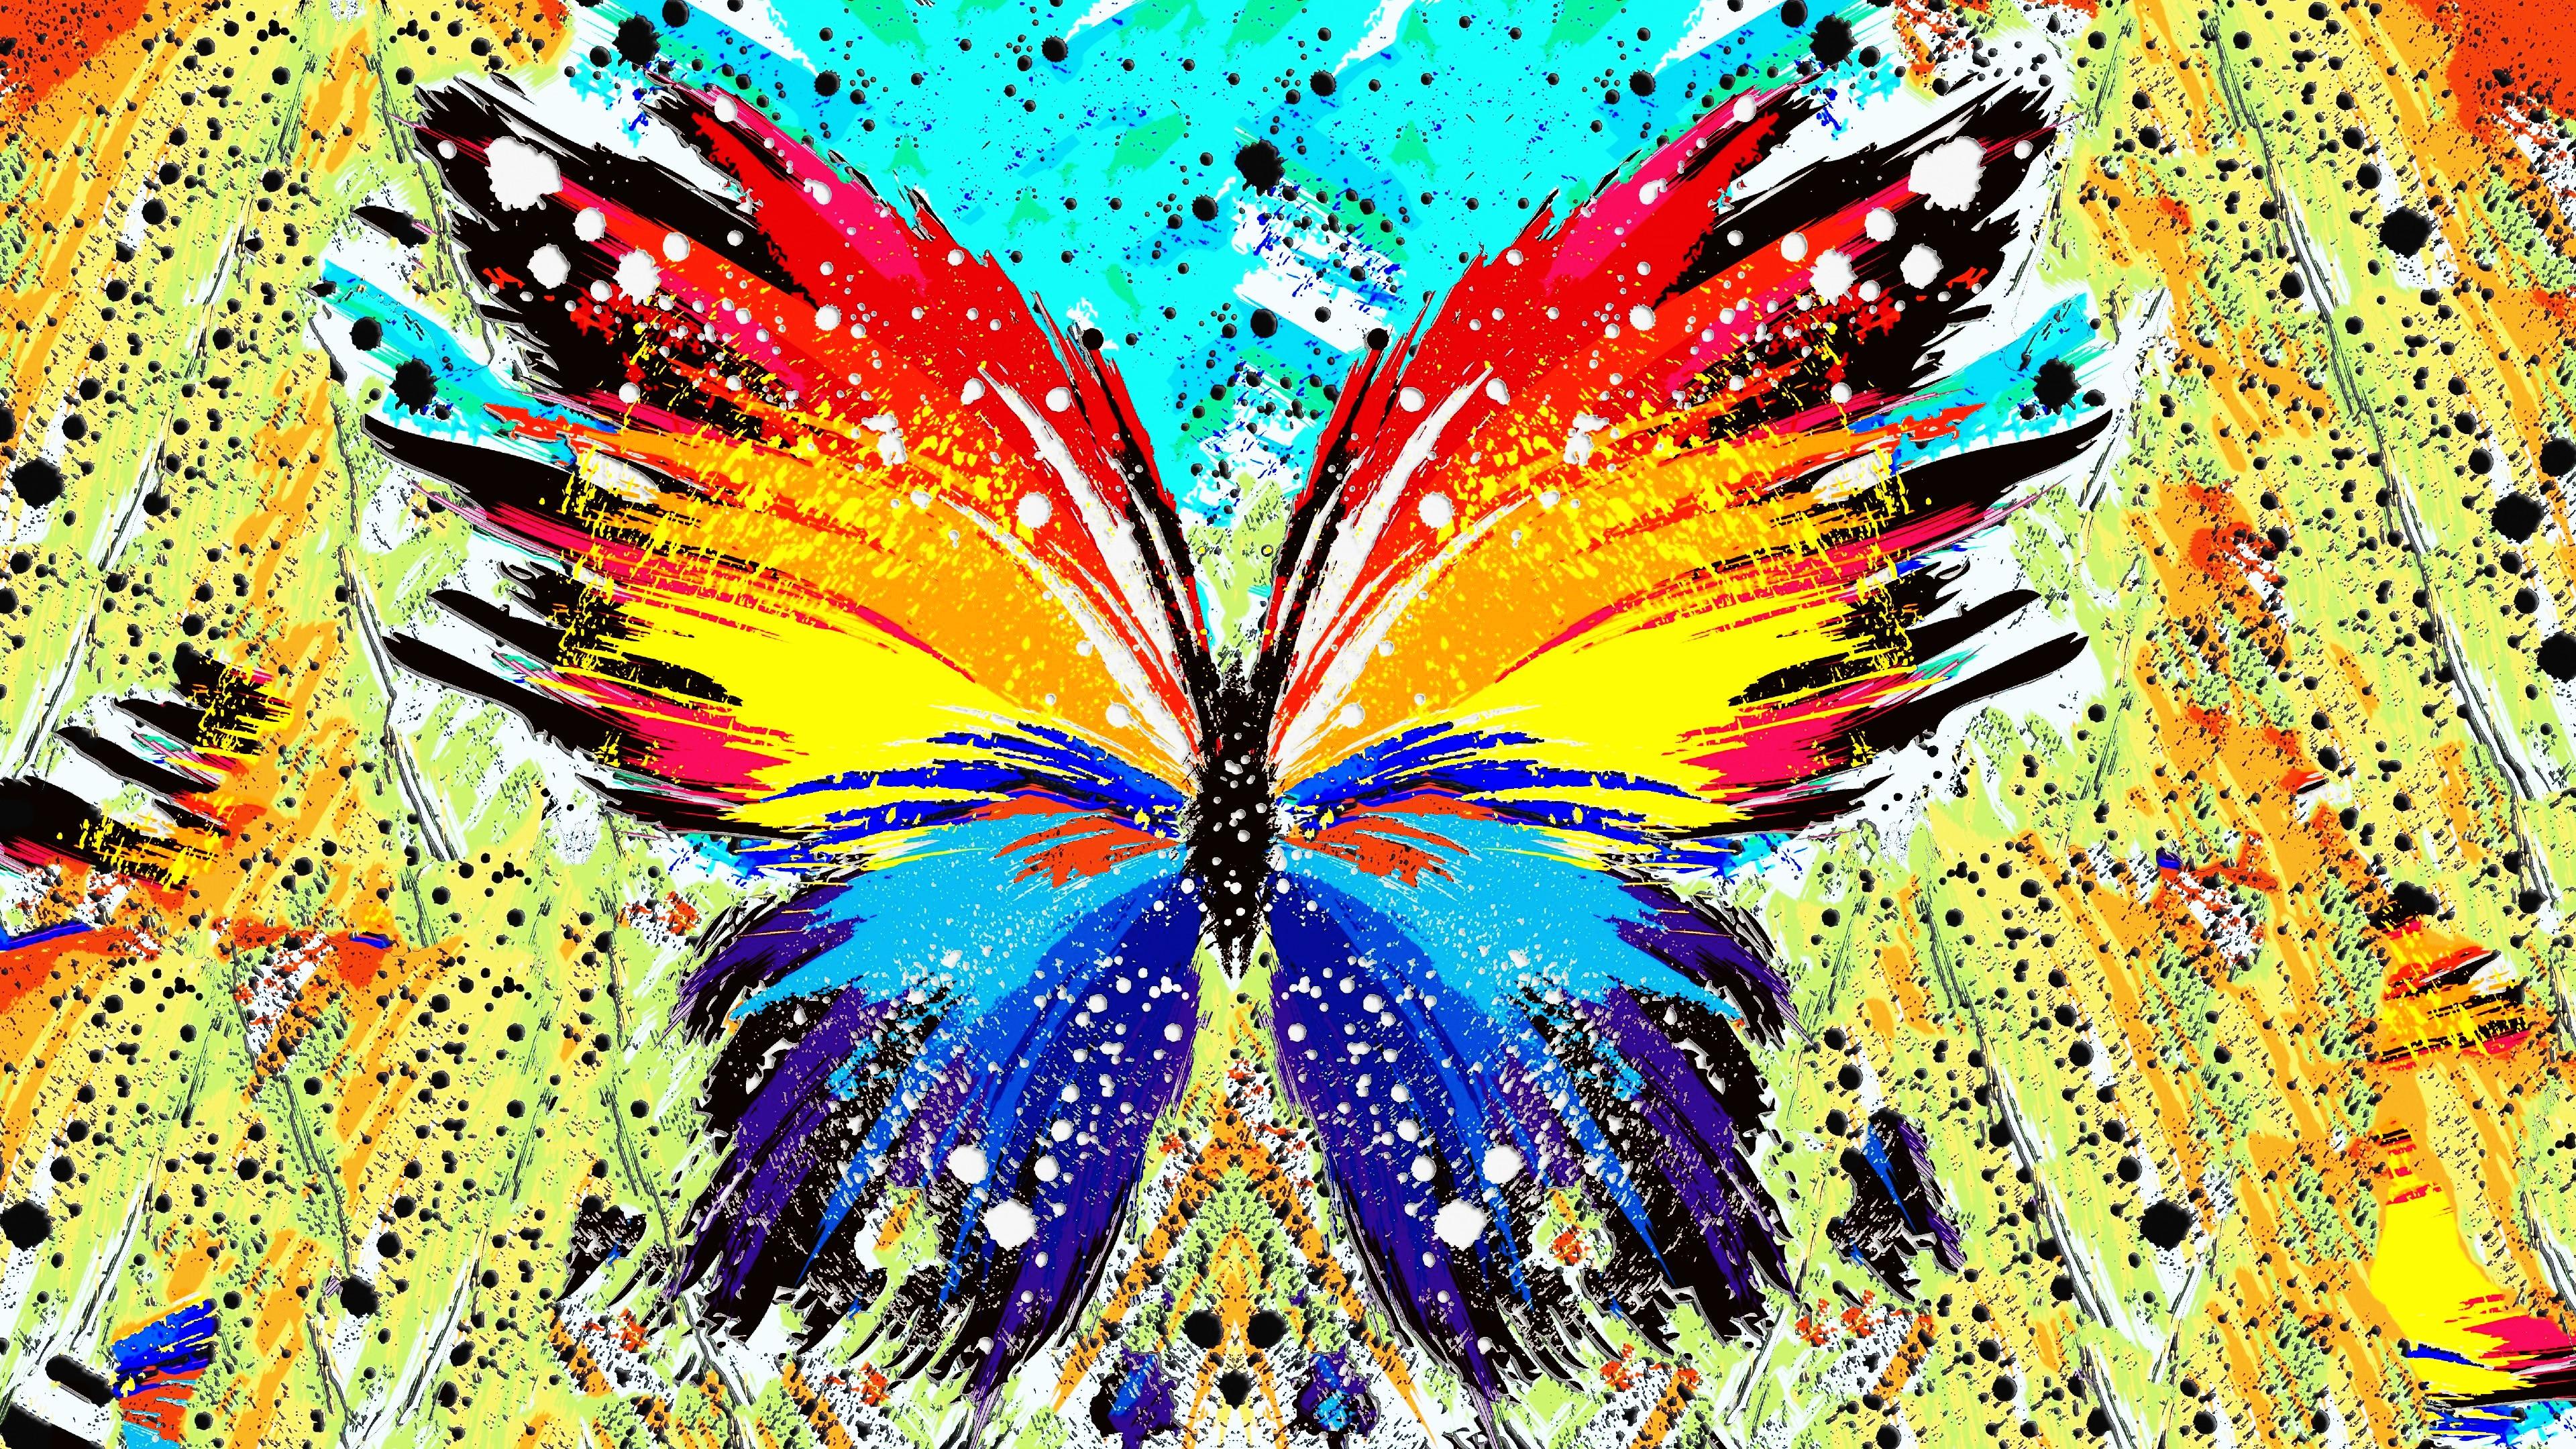 Illustration Abstract Butterfly Insect Pattern Paint Splatter ART Leaf Flower Modern Art Psychedelic Invertebrate Moths